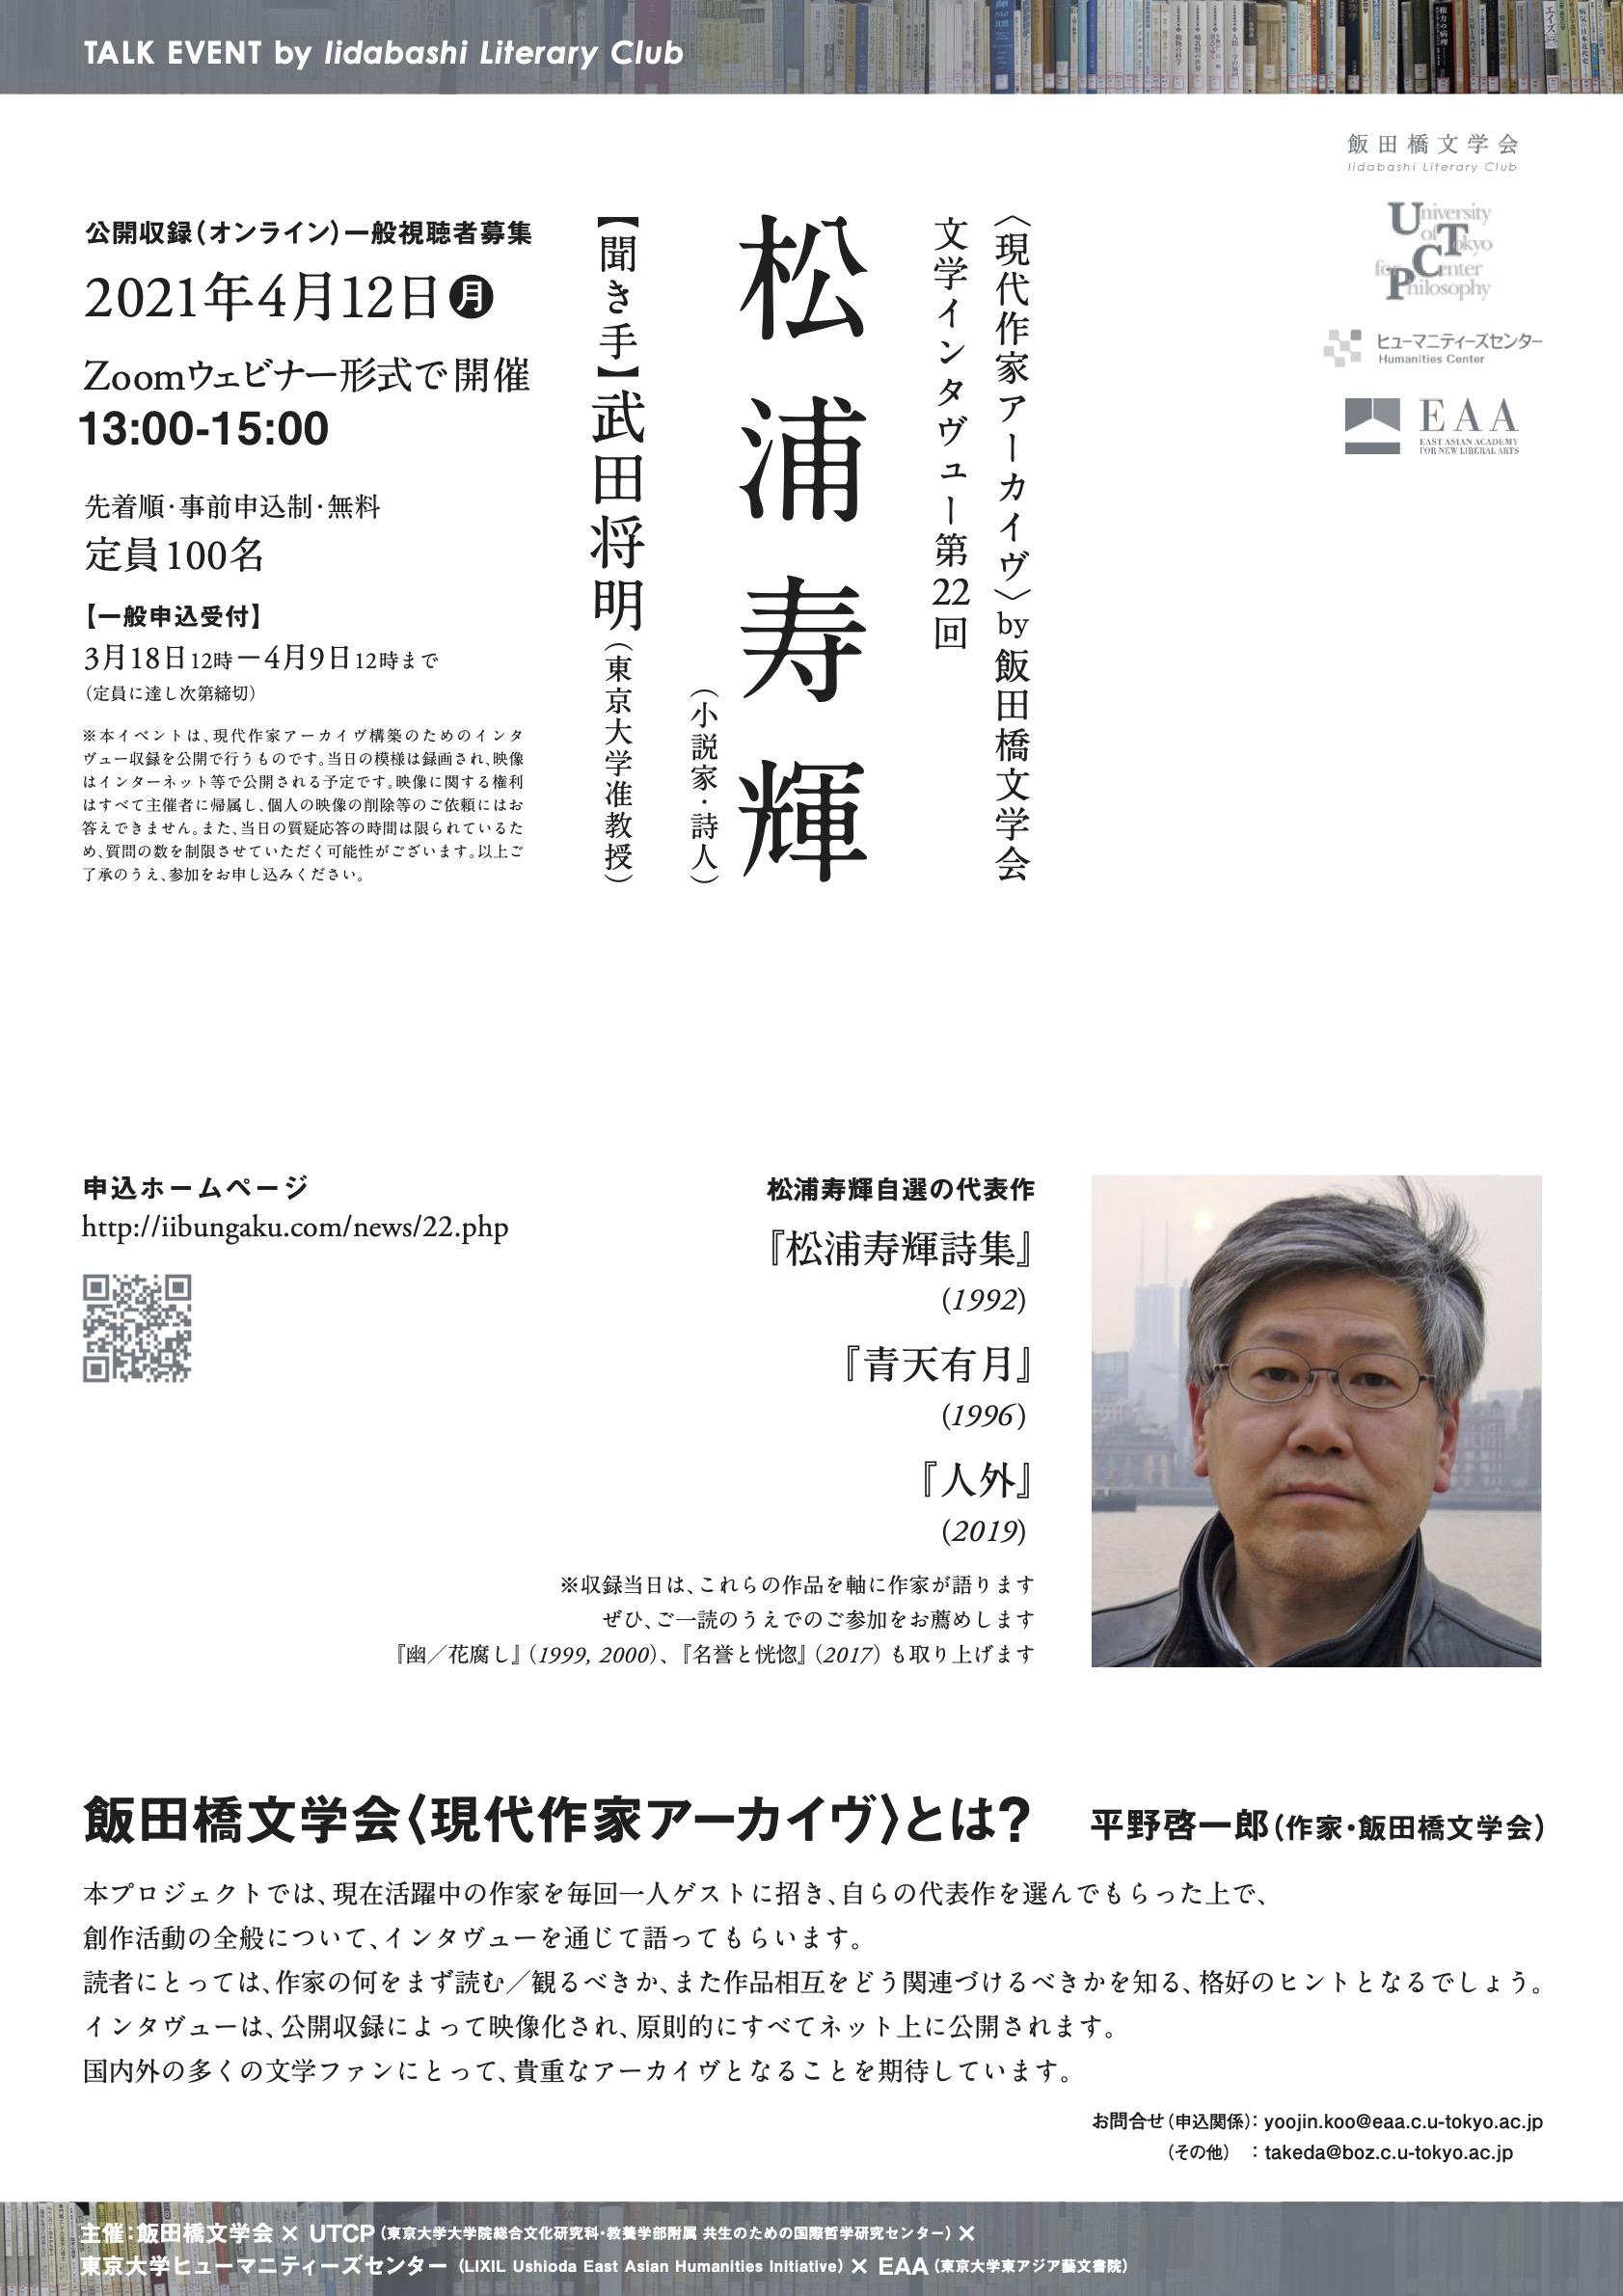 http://iibungaku.com/Matsuura_Hisaki_20210316.jpg